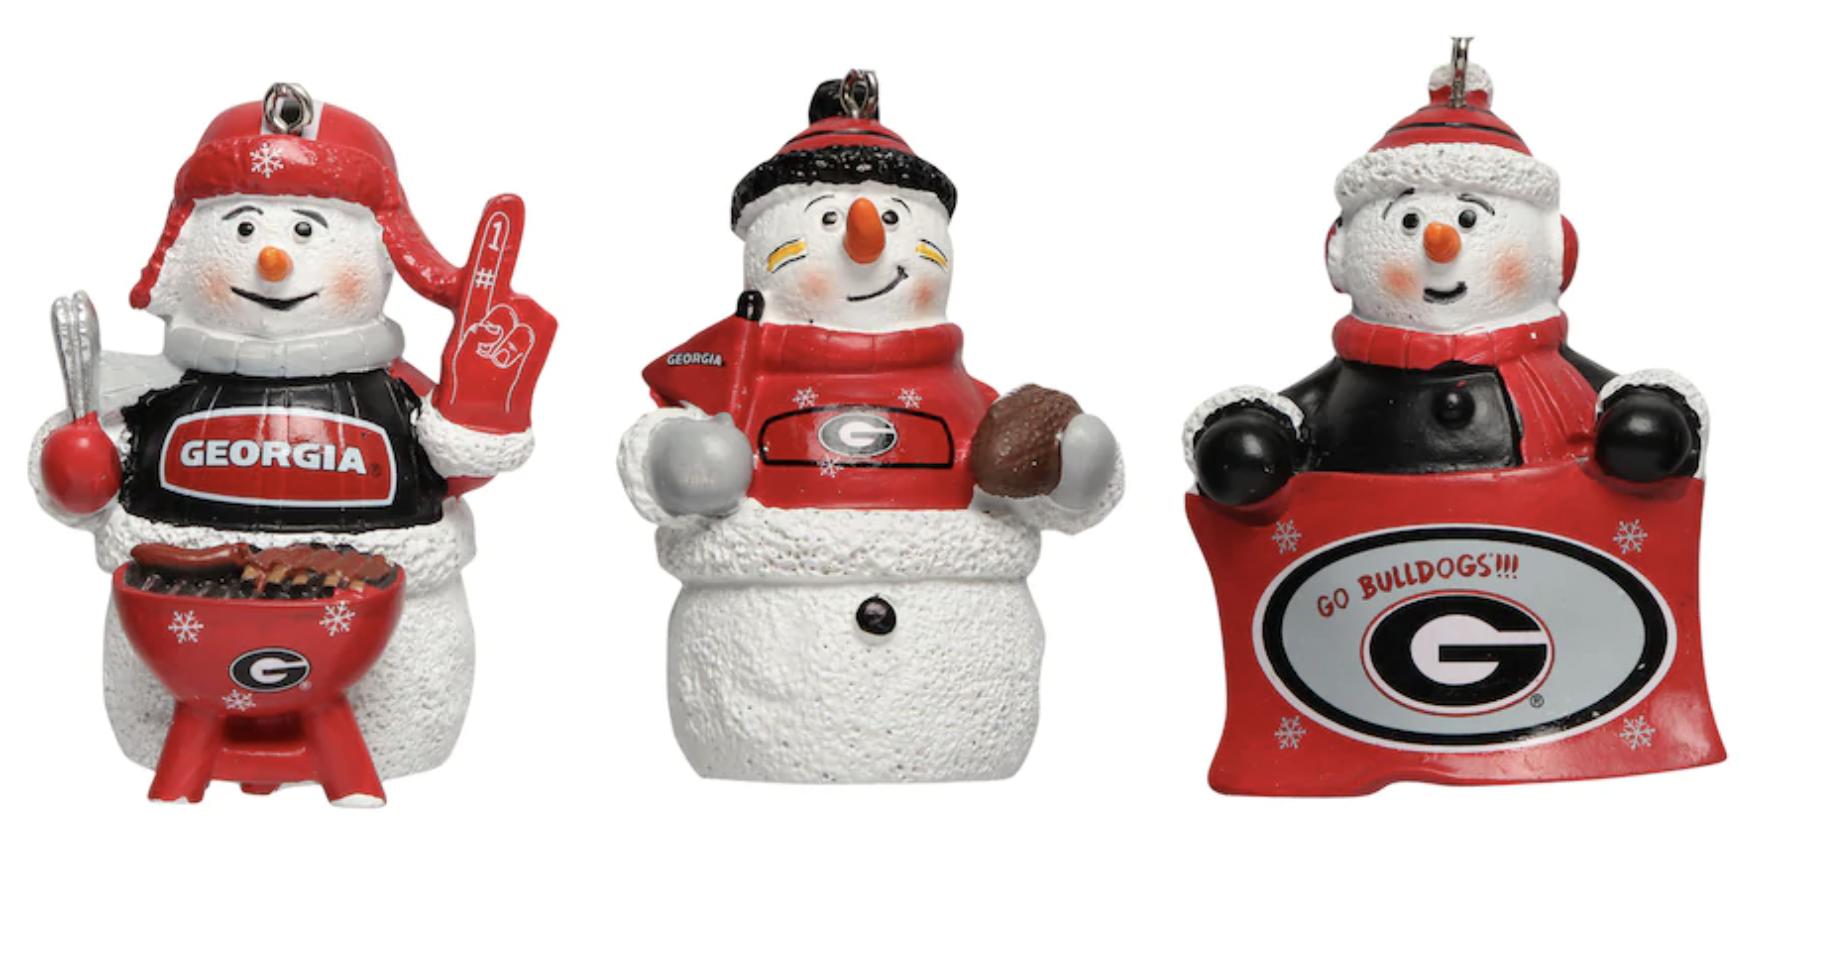 Georgia Bulldogs Three-Pack Snowman Gameday Ornament Set